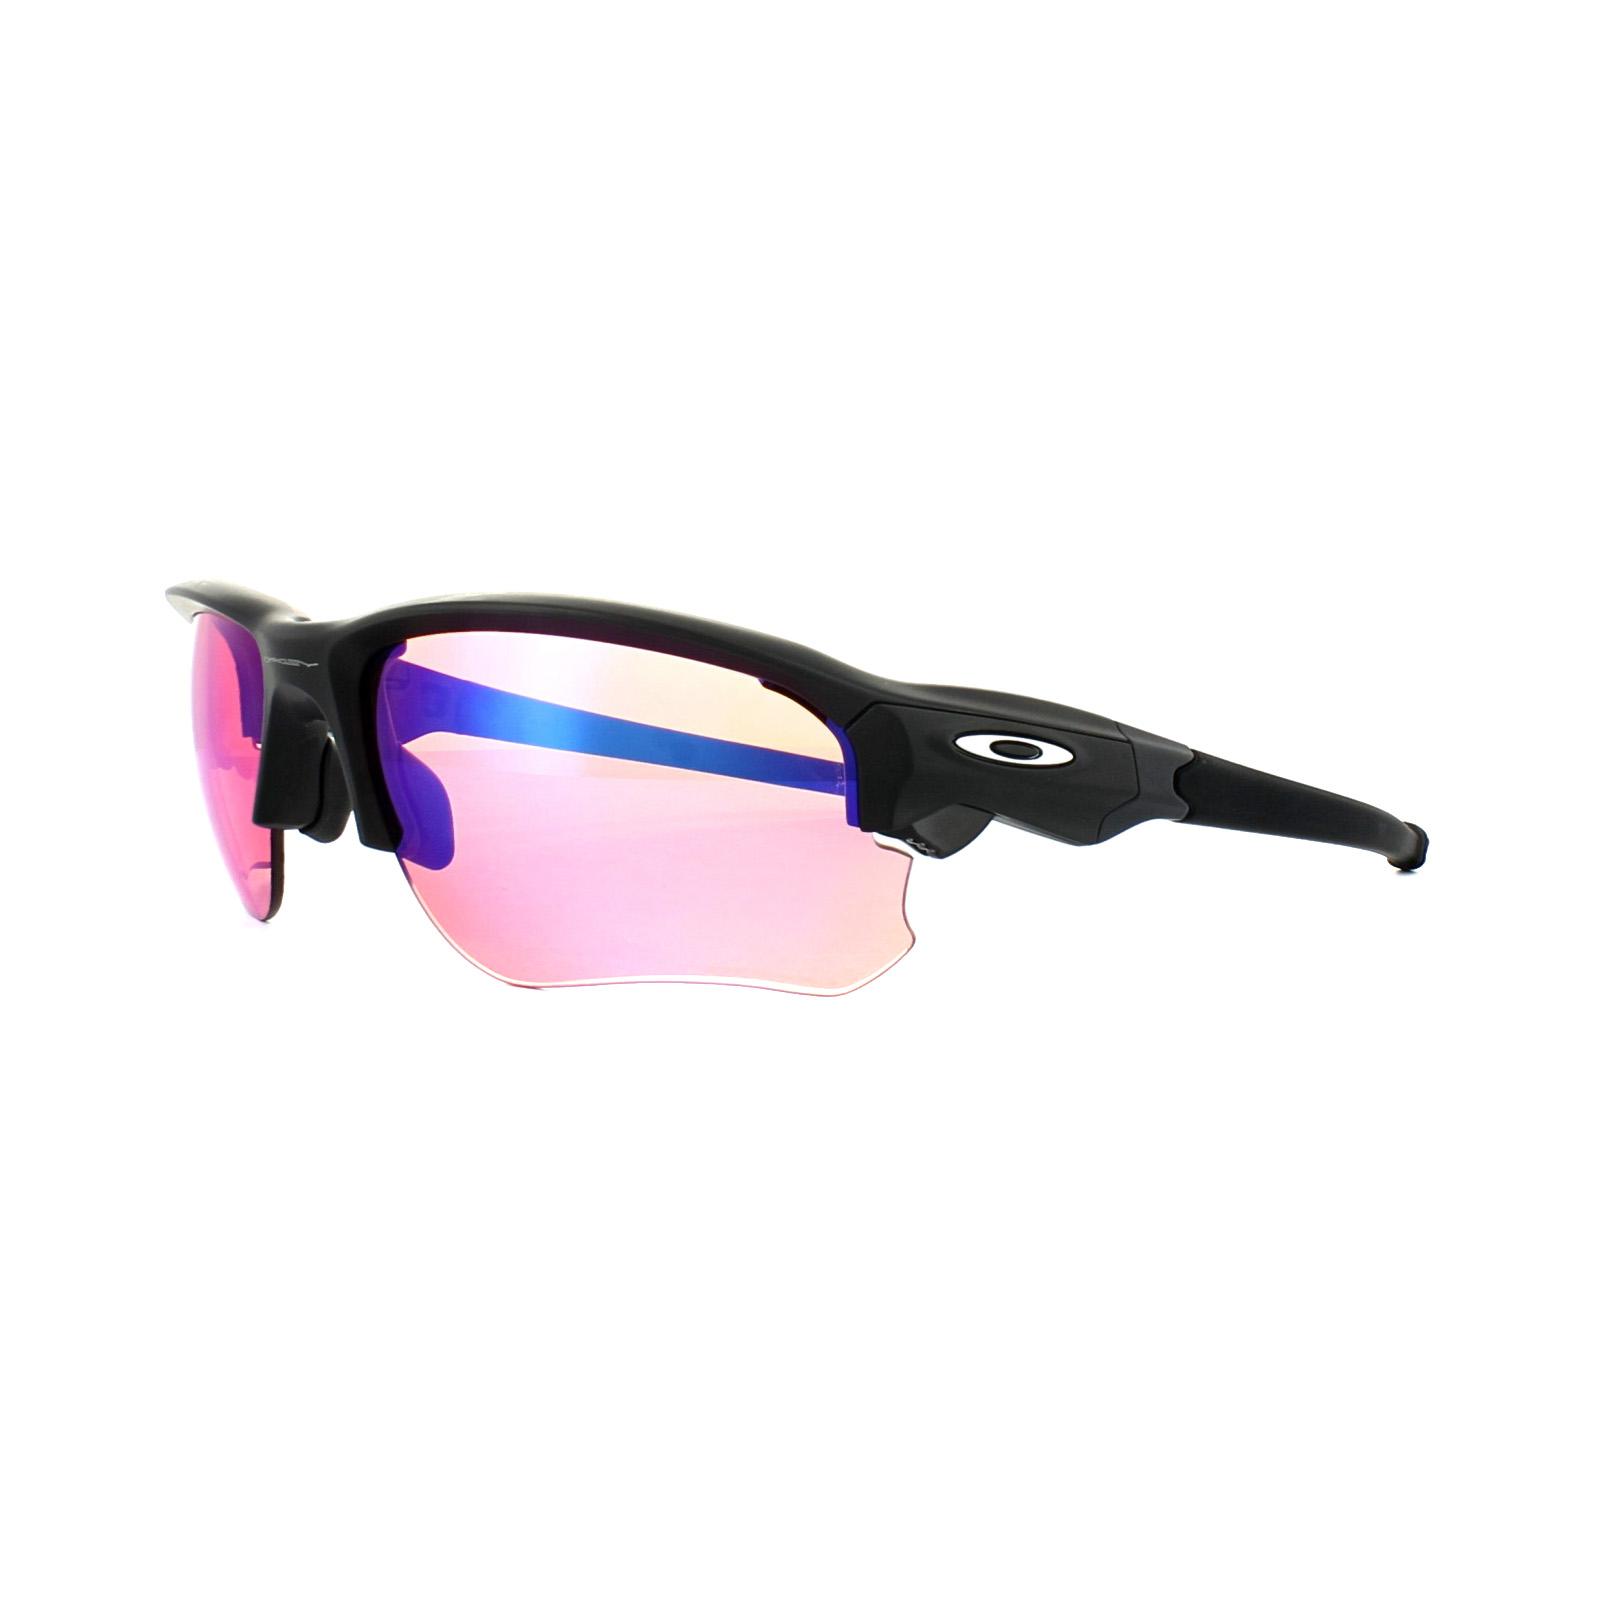 17165e8acf Cheap Oakley Flak Draft Sunglasses - Discounted Sunglasses